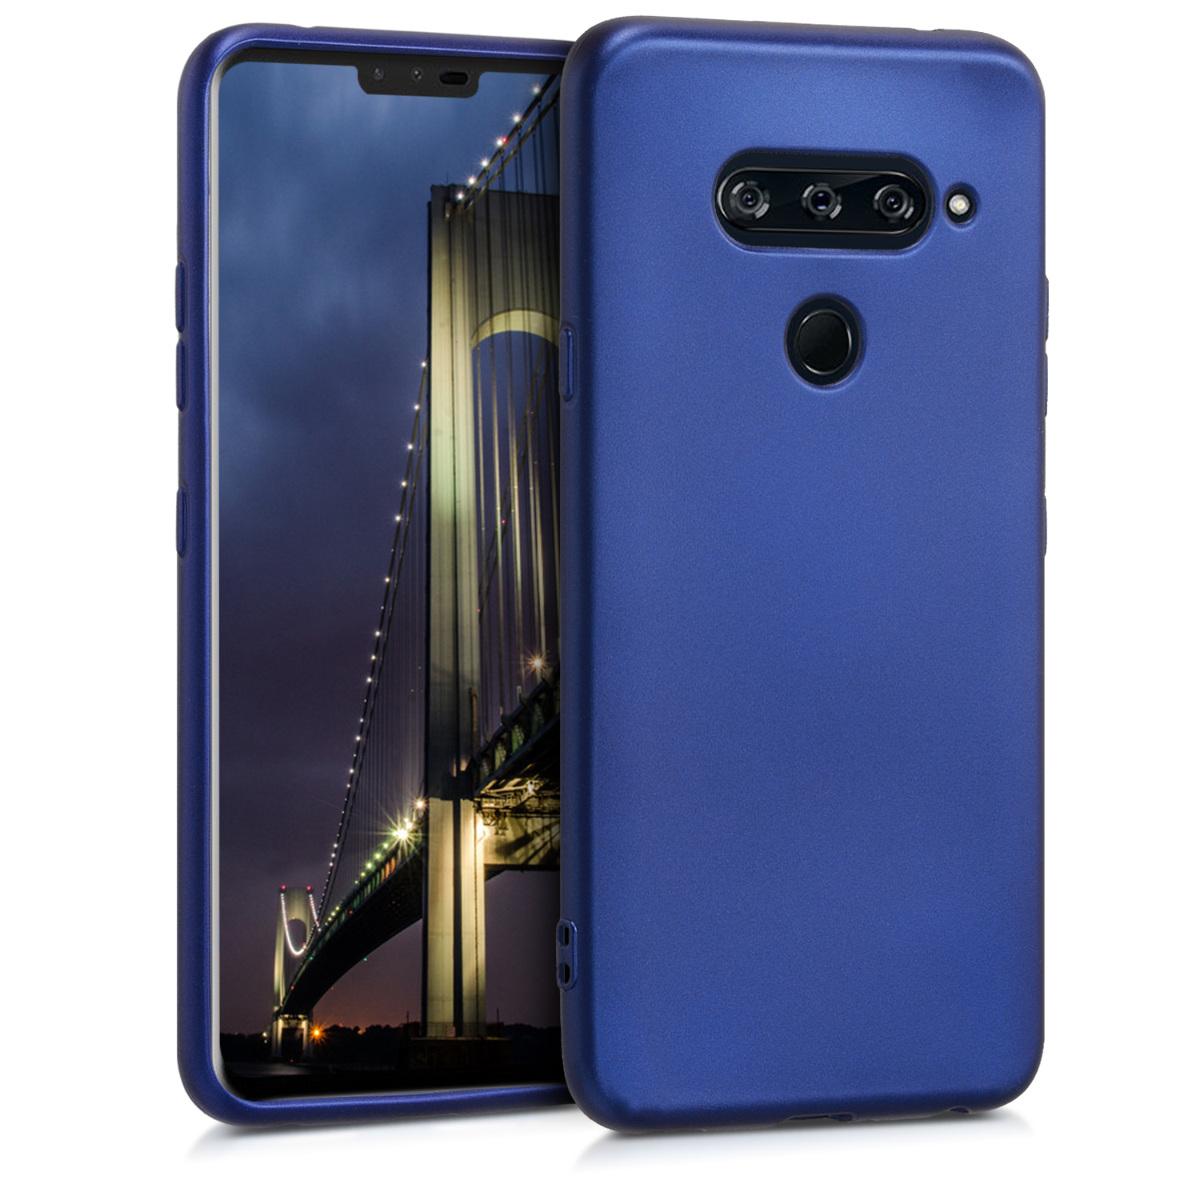 KW Θήκη Σιλικόνης LG V40 ThinQ - Metallic Blue (47437.64)